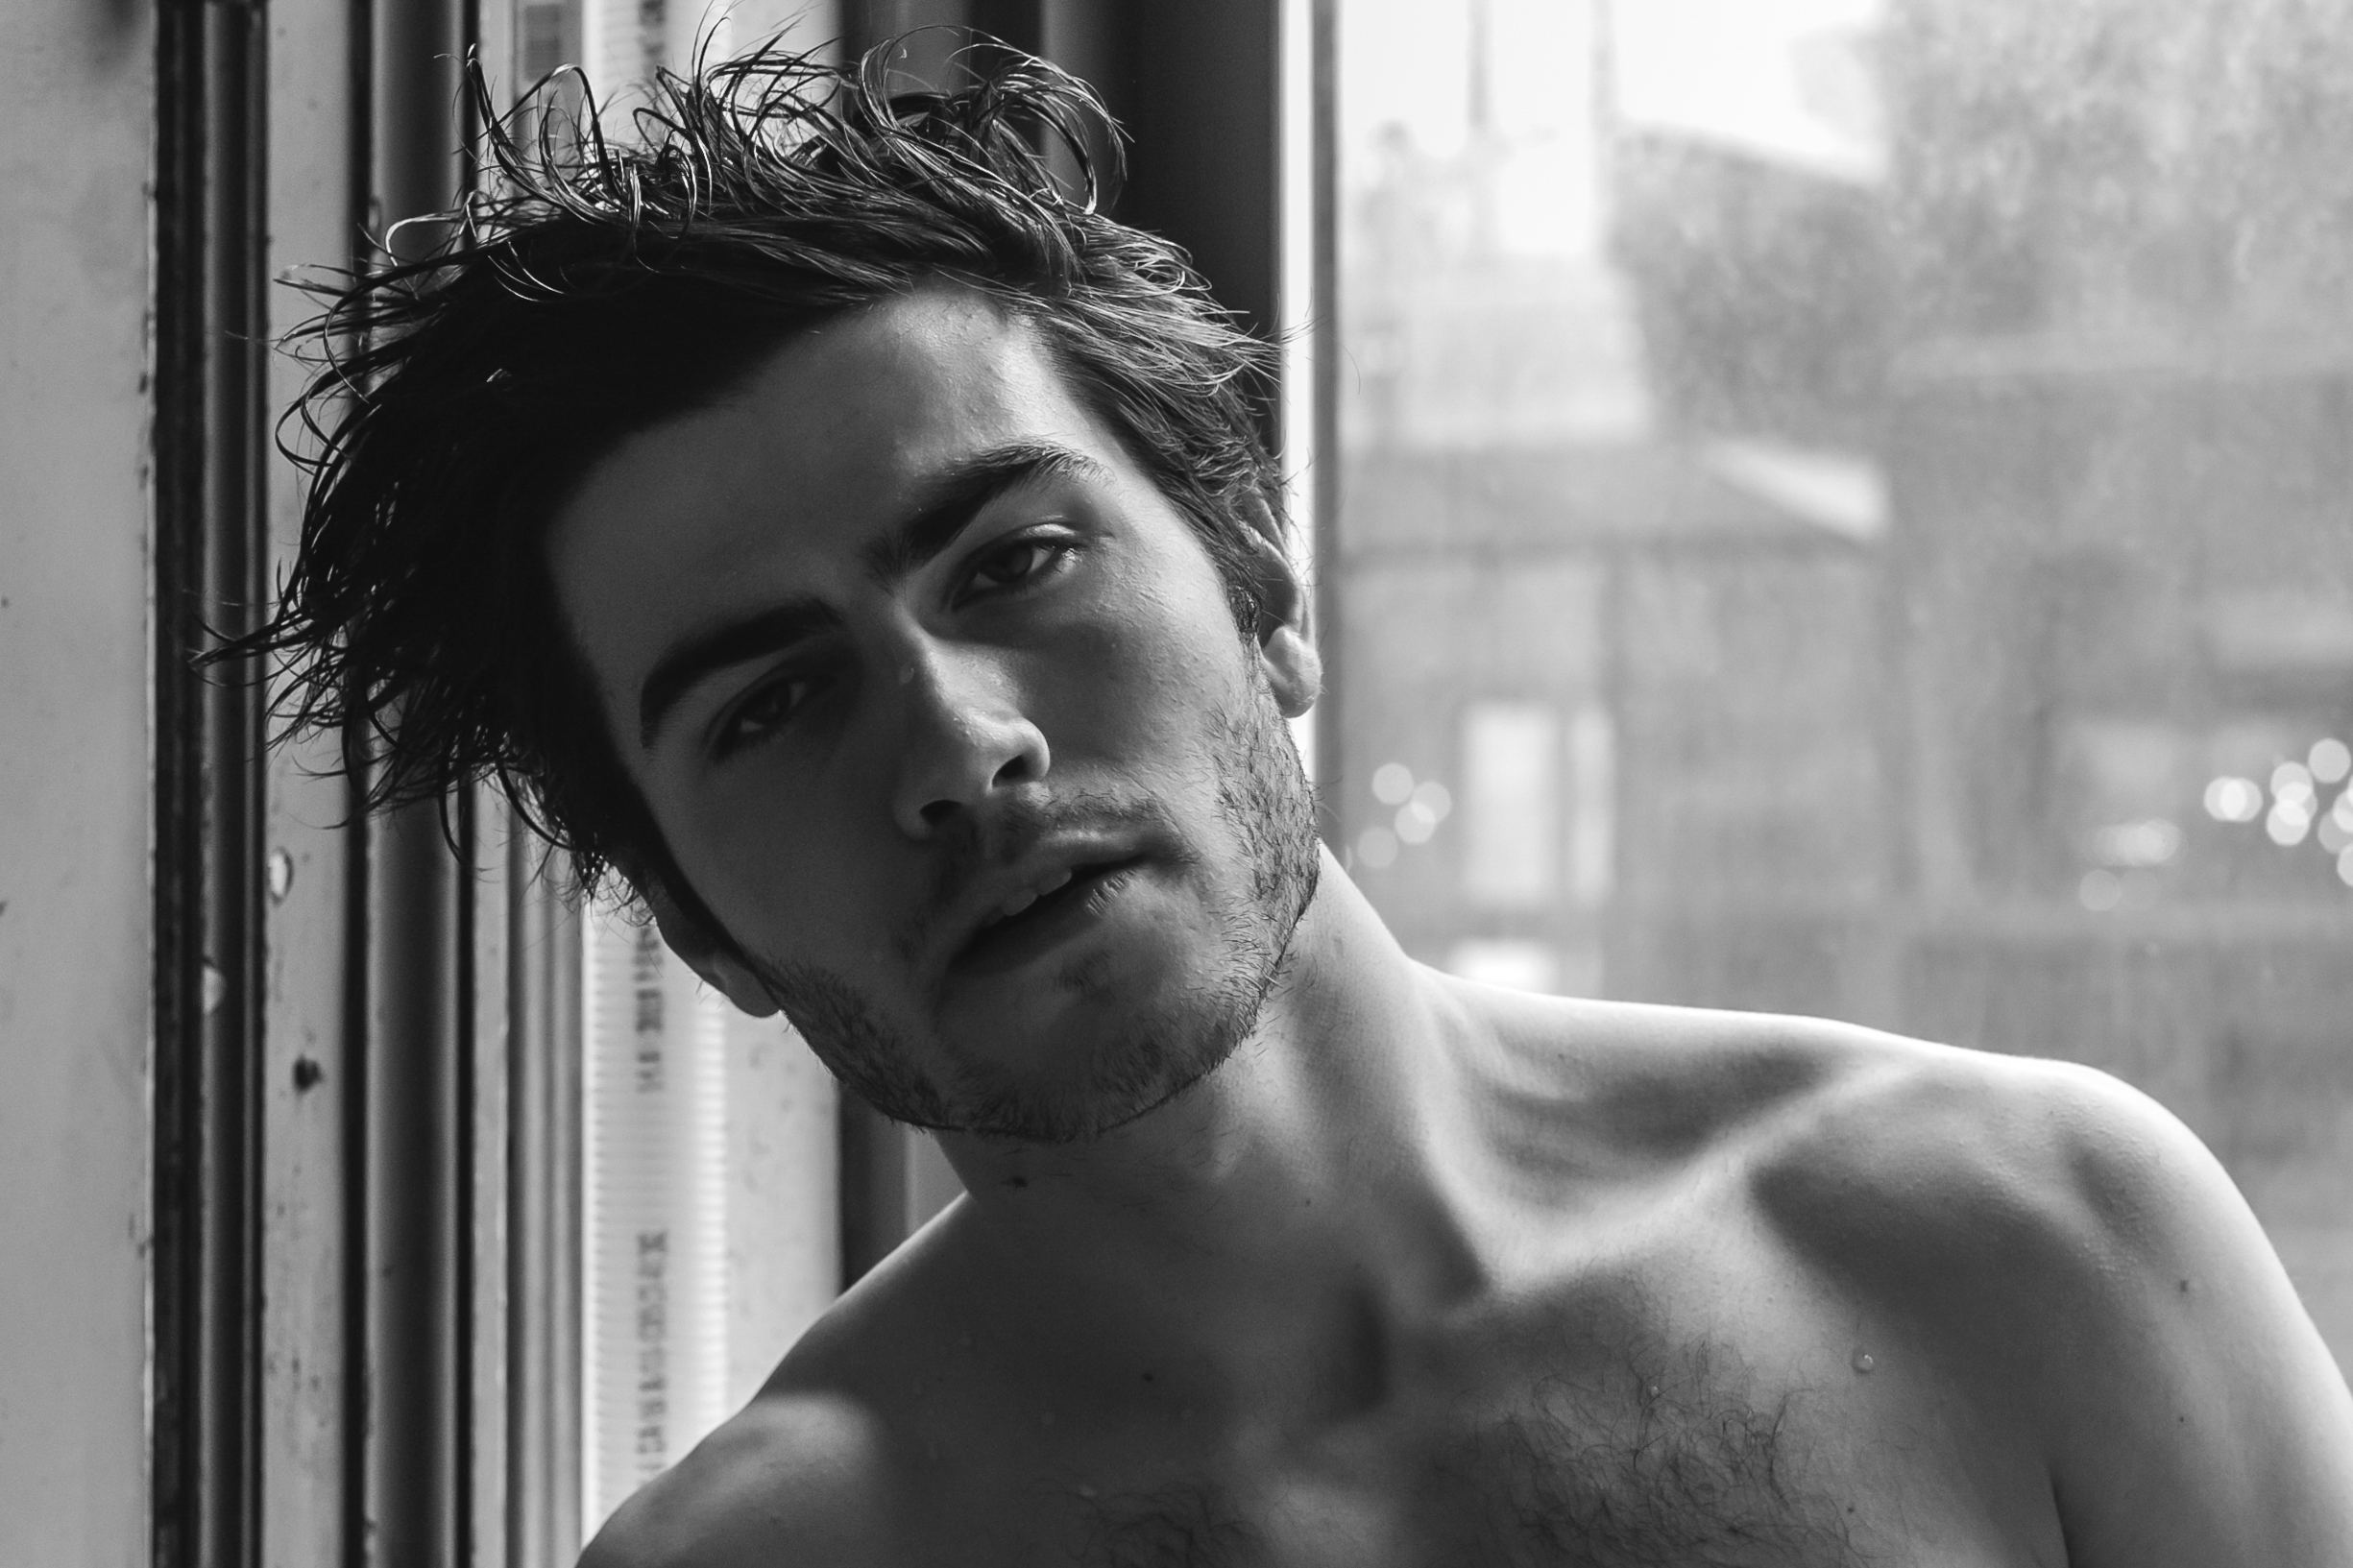 Dylan DeCandia